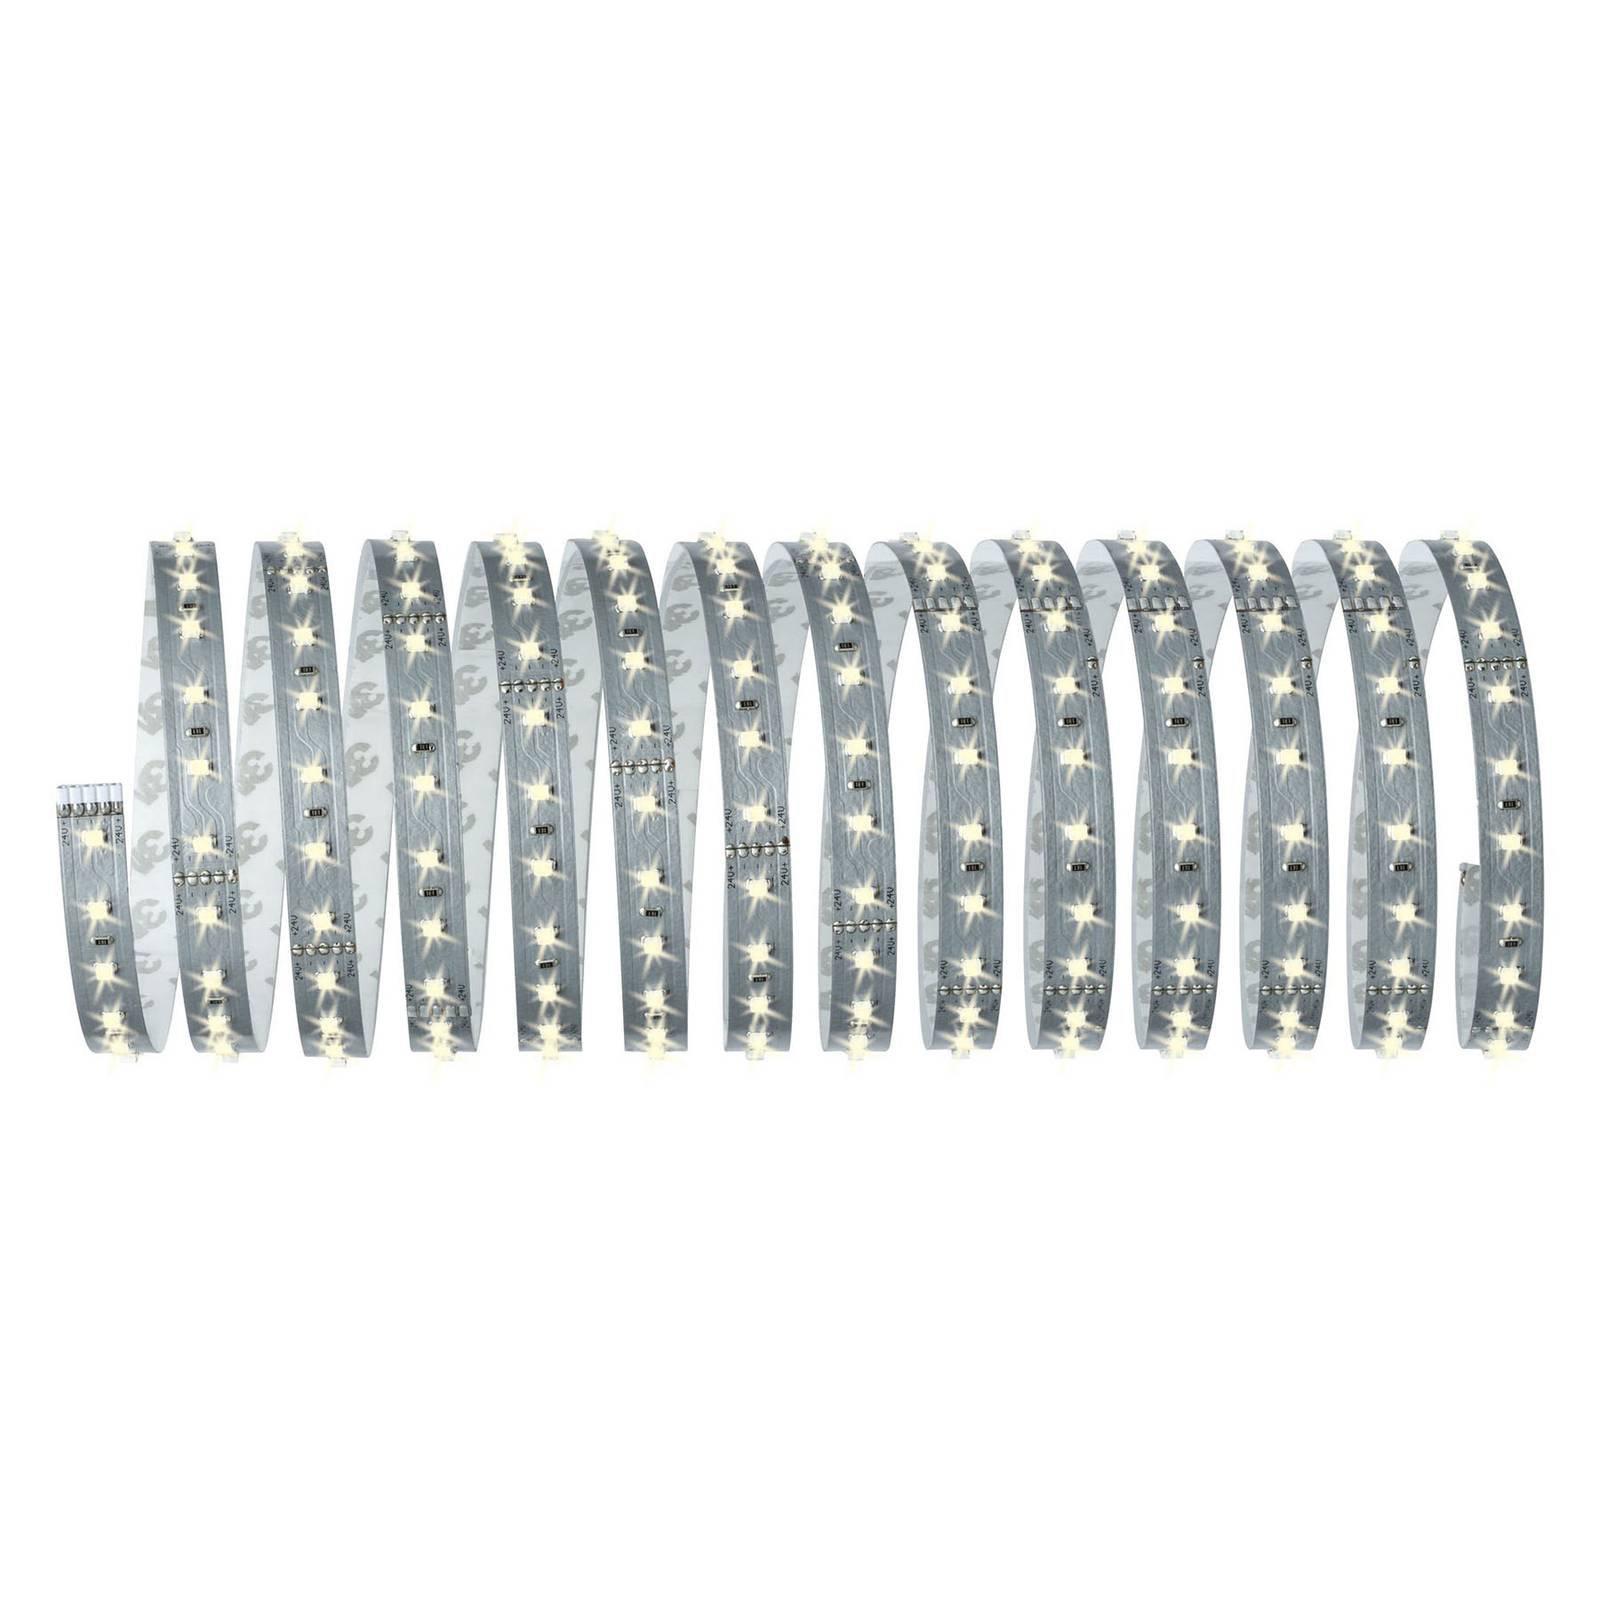 Paulmann MaxLED 500 LED-stripe, pakke 5 m, 2 700 K